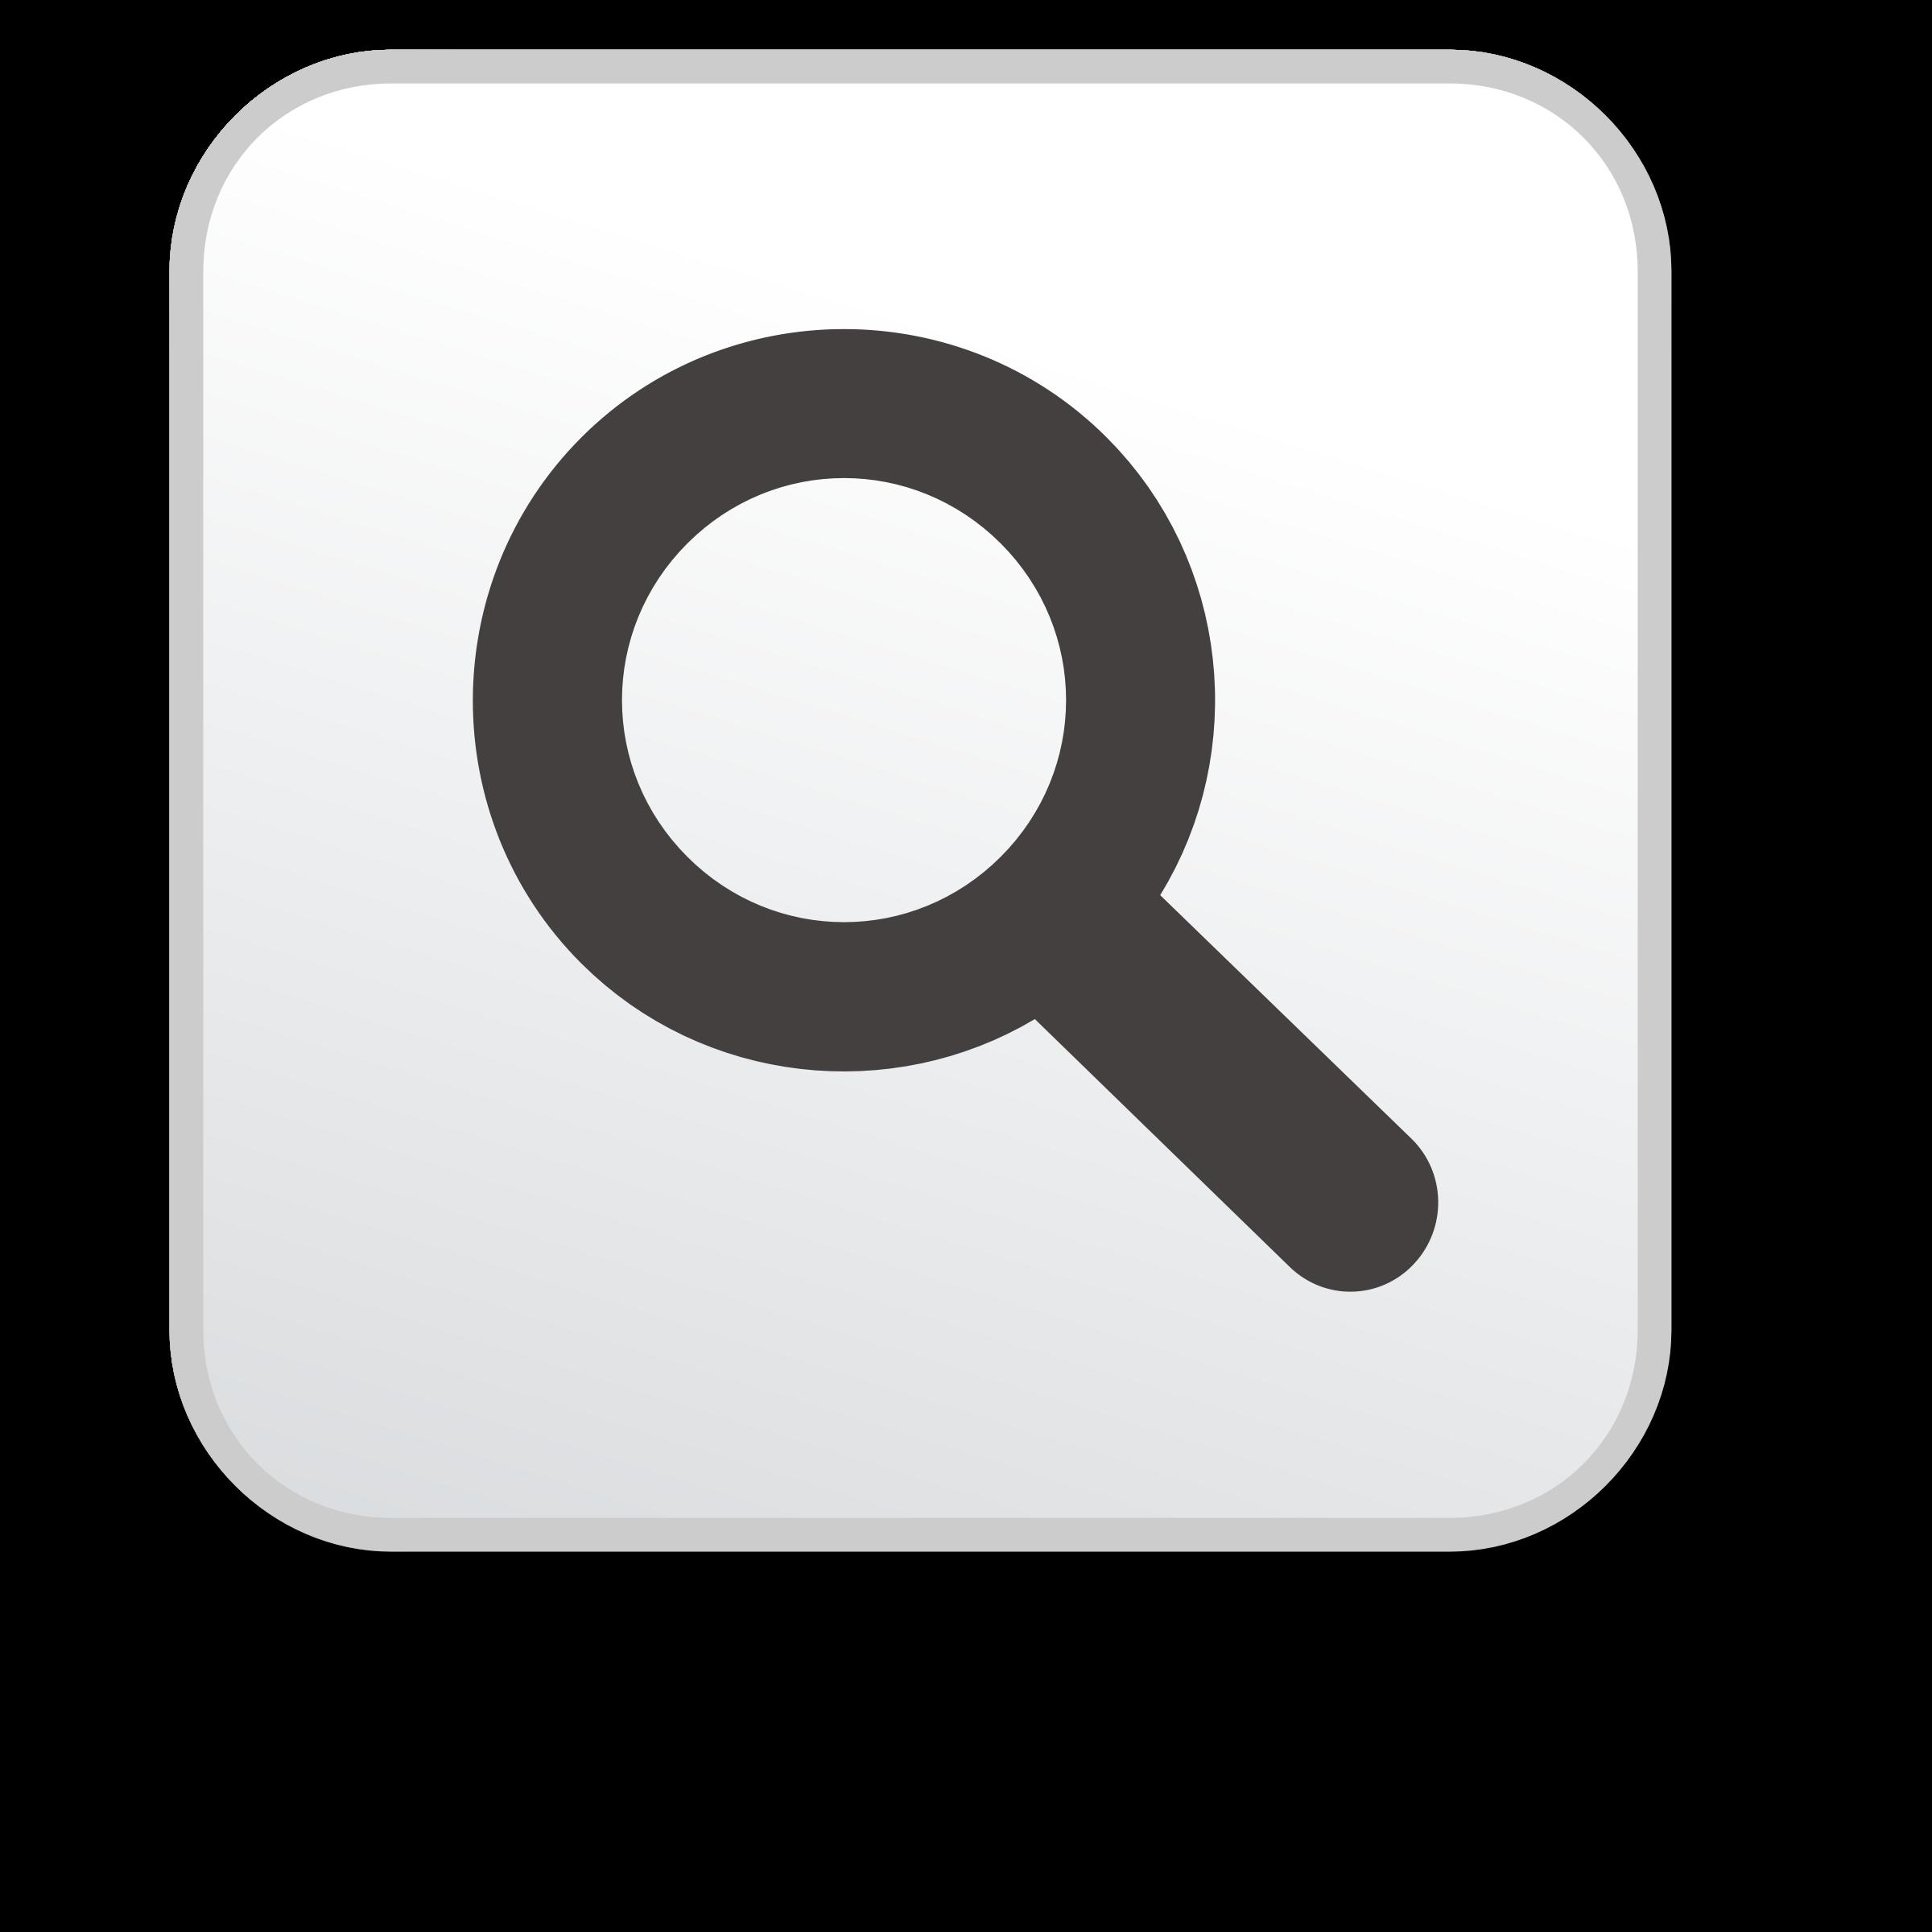 Search png uiux pinterest. Website clipart web icon